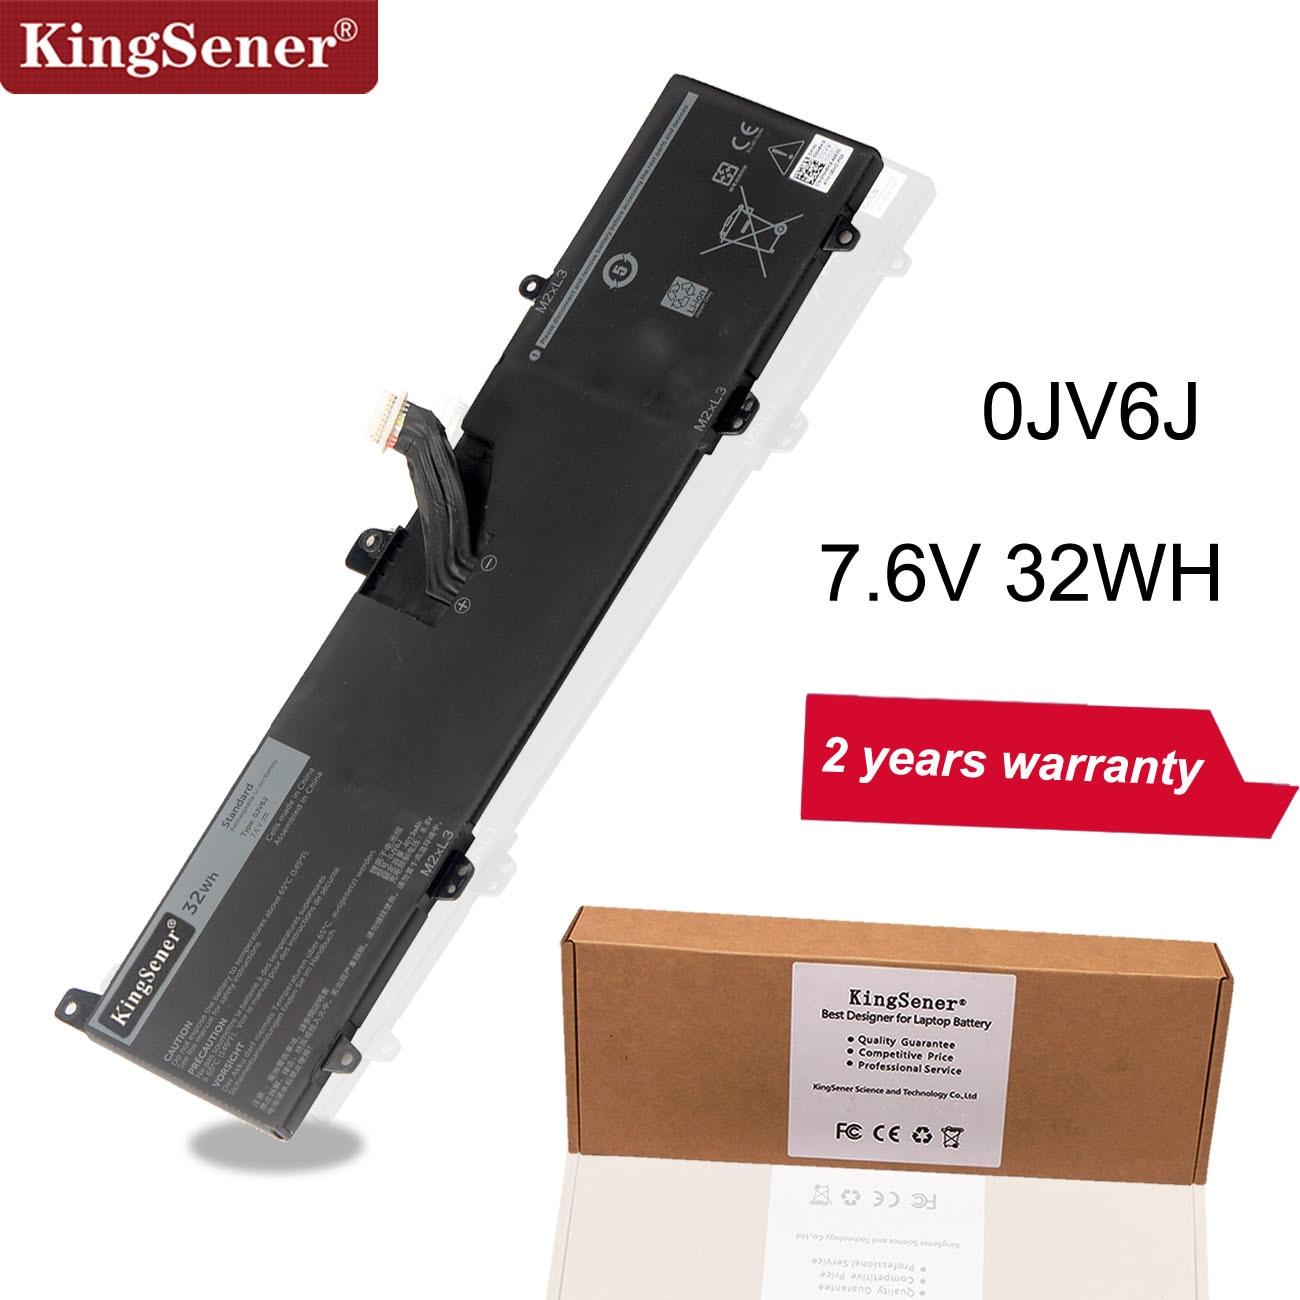 KingSener 0JV6J Laptop Battery For Dell Inspiron 11-3000 3162 3164 3168 8NWF3 PGYK5 0HH6K9 7.6V 32Wh